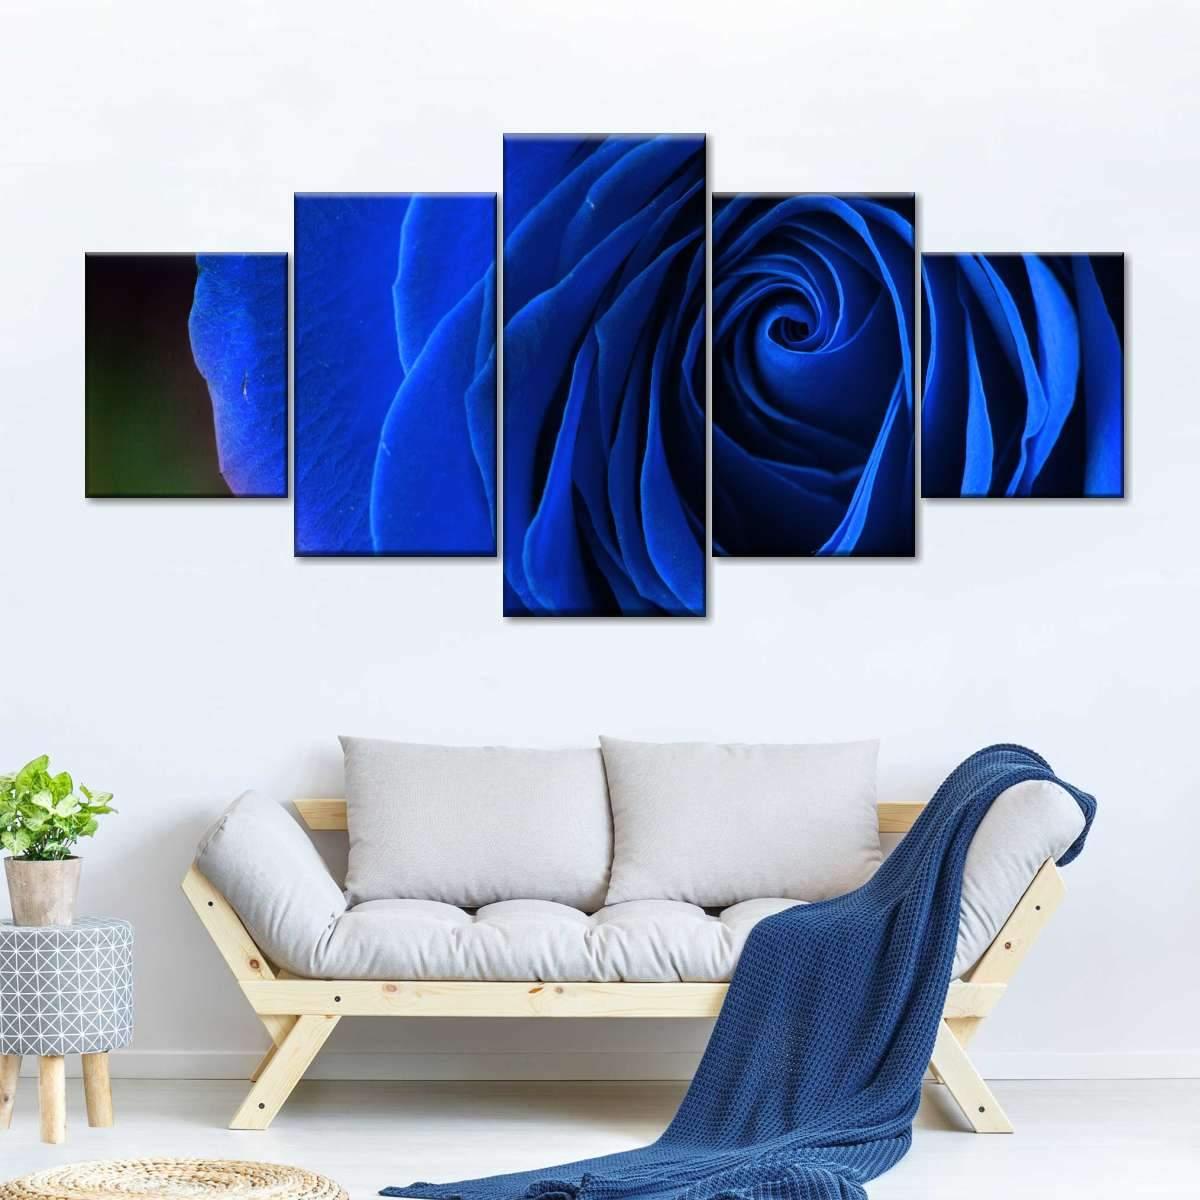 Blue Rose Shrub Multi Panel Canvas Wall Art